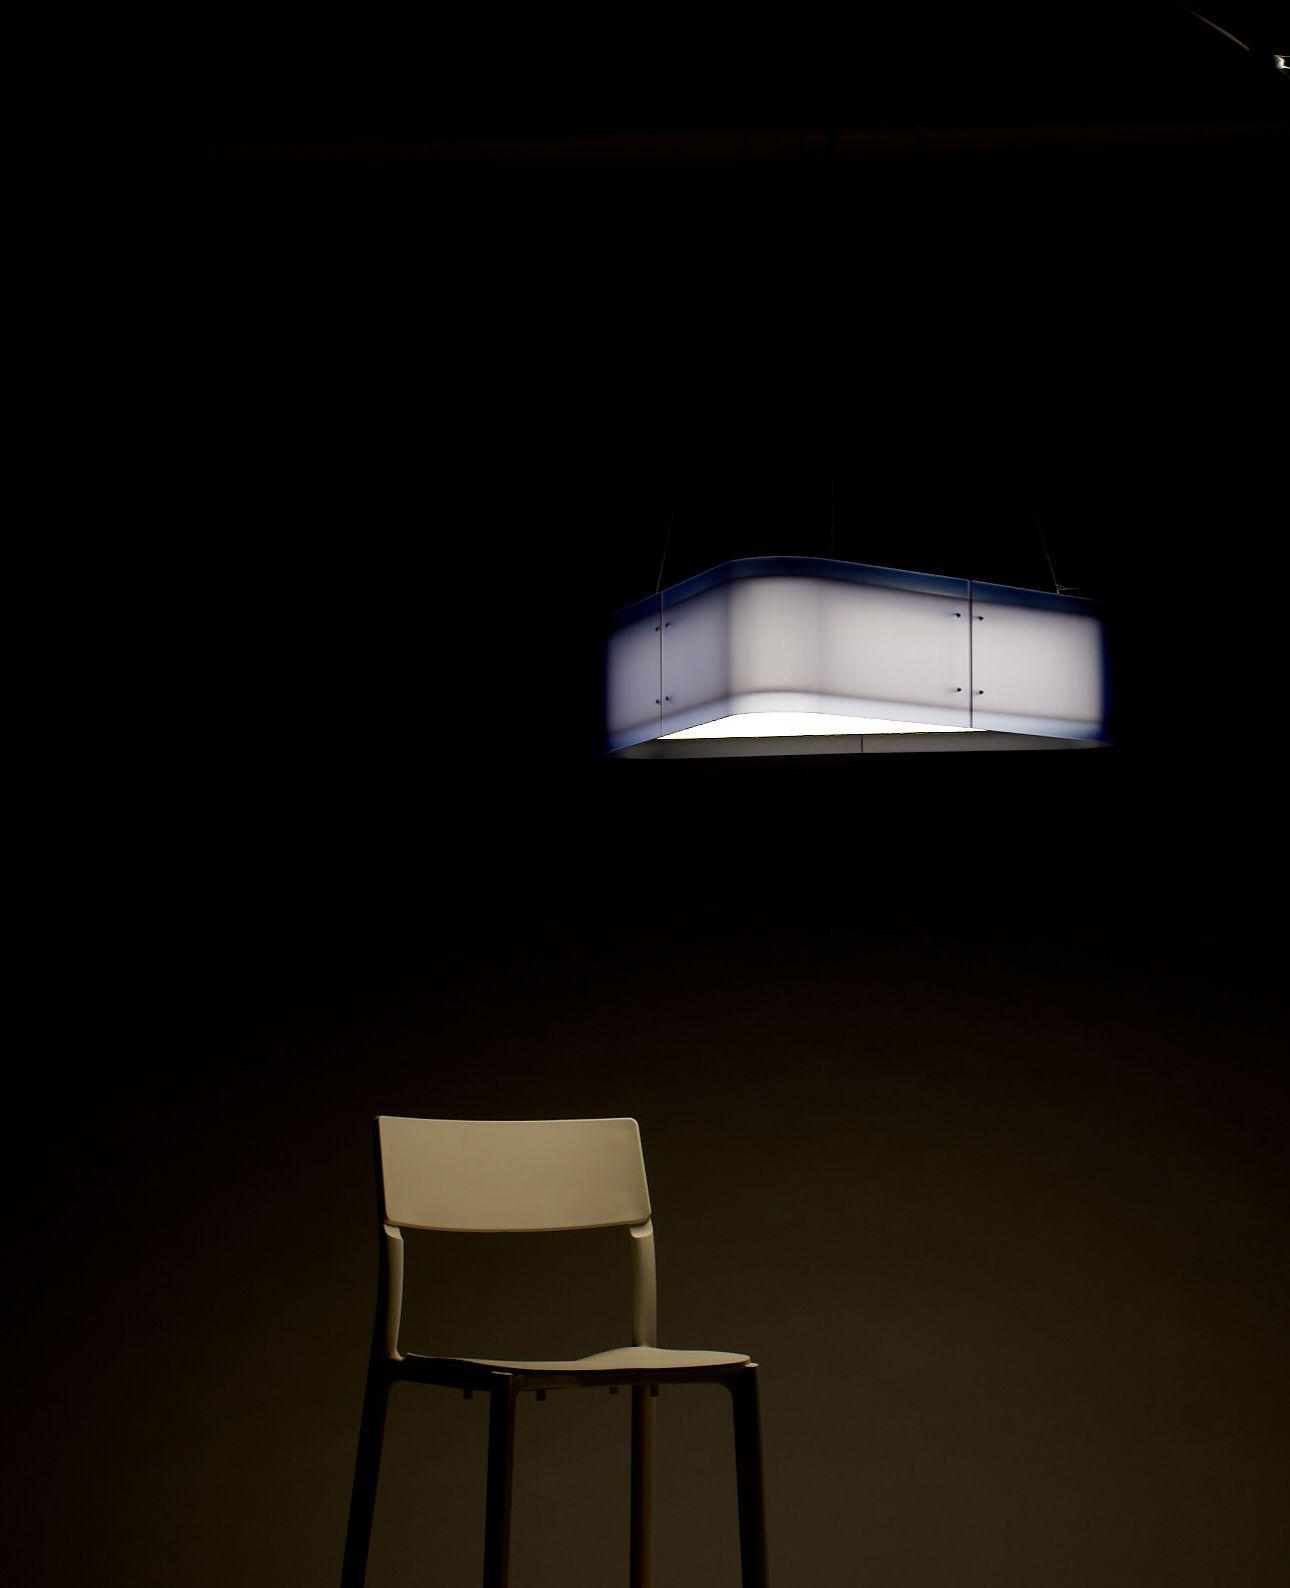 Custom lighting handmade in seattle made from 3form varia ecoresin